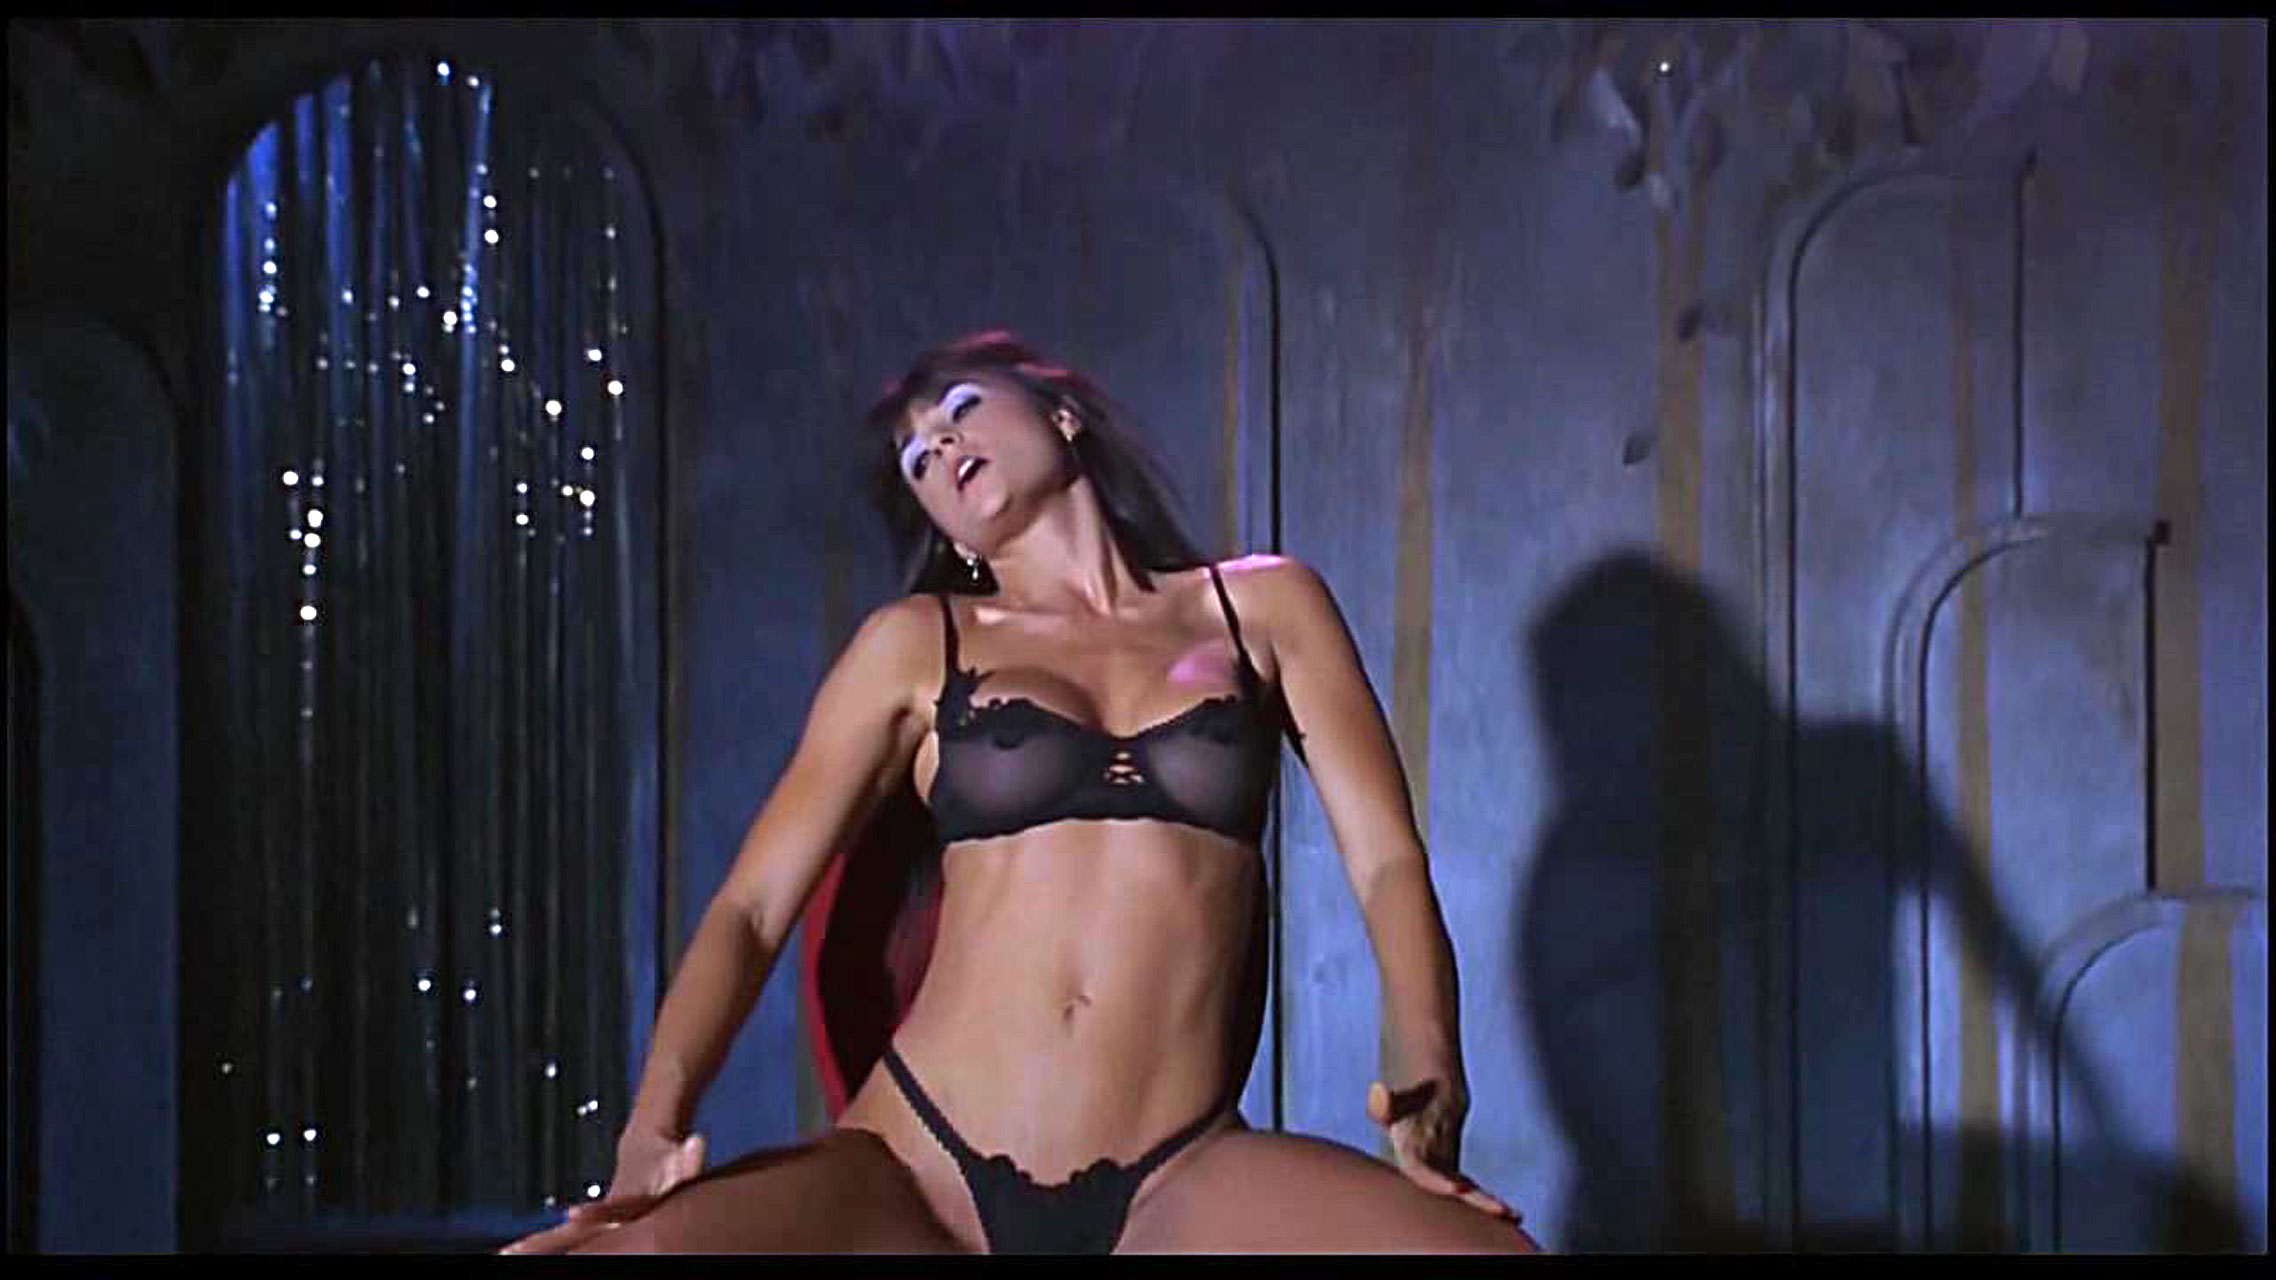 Стрептизёрша танцует стрептиз 8 фотография